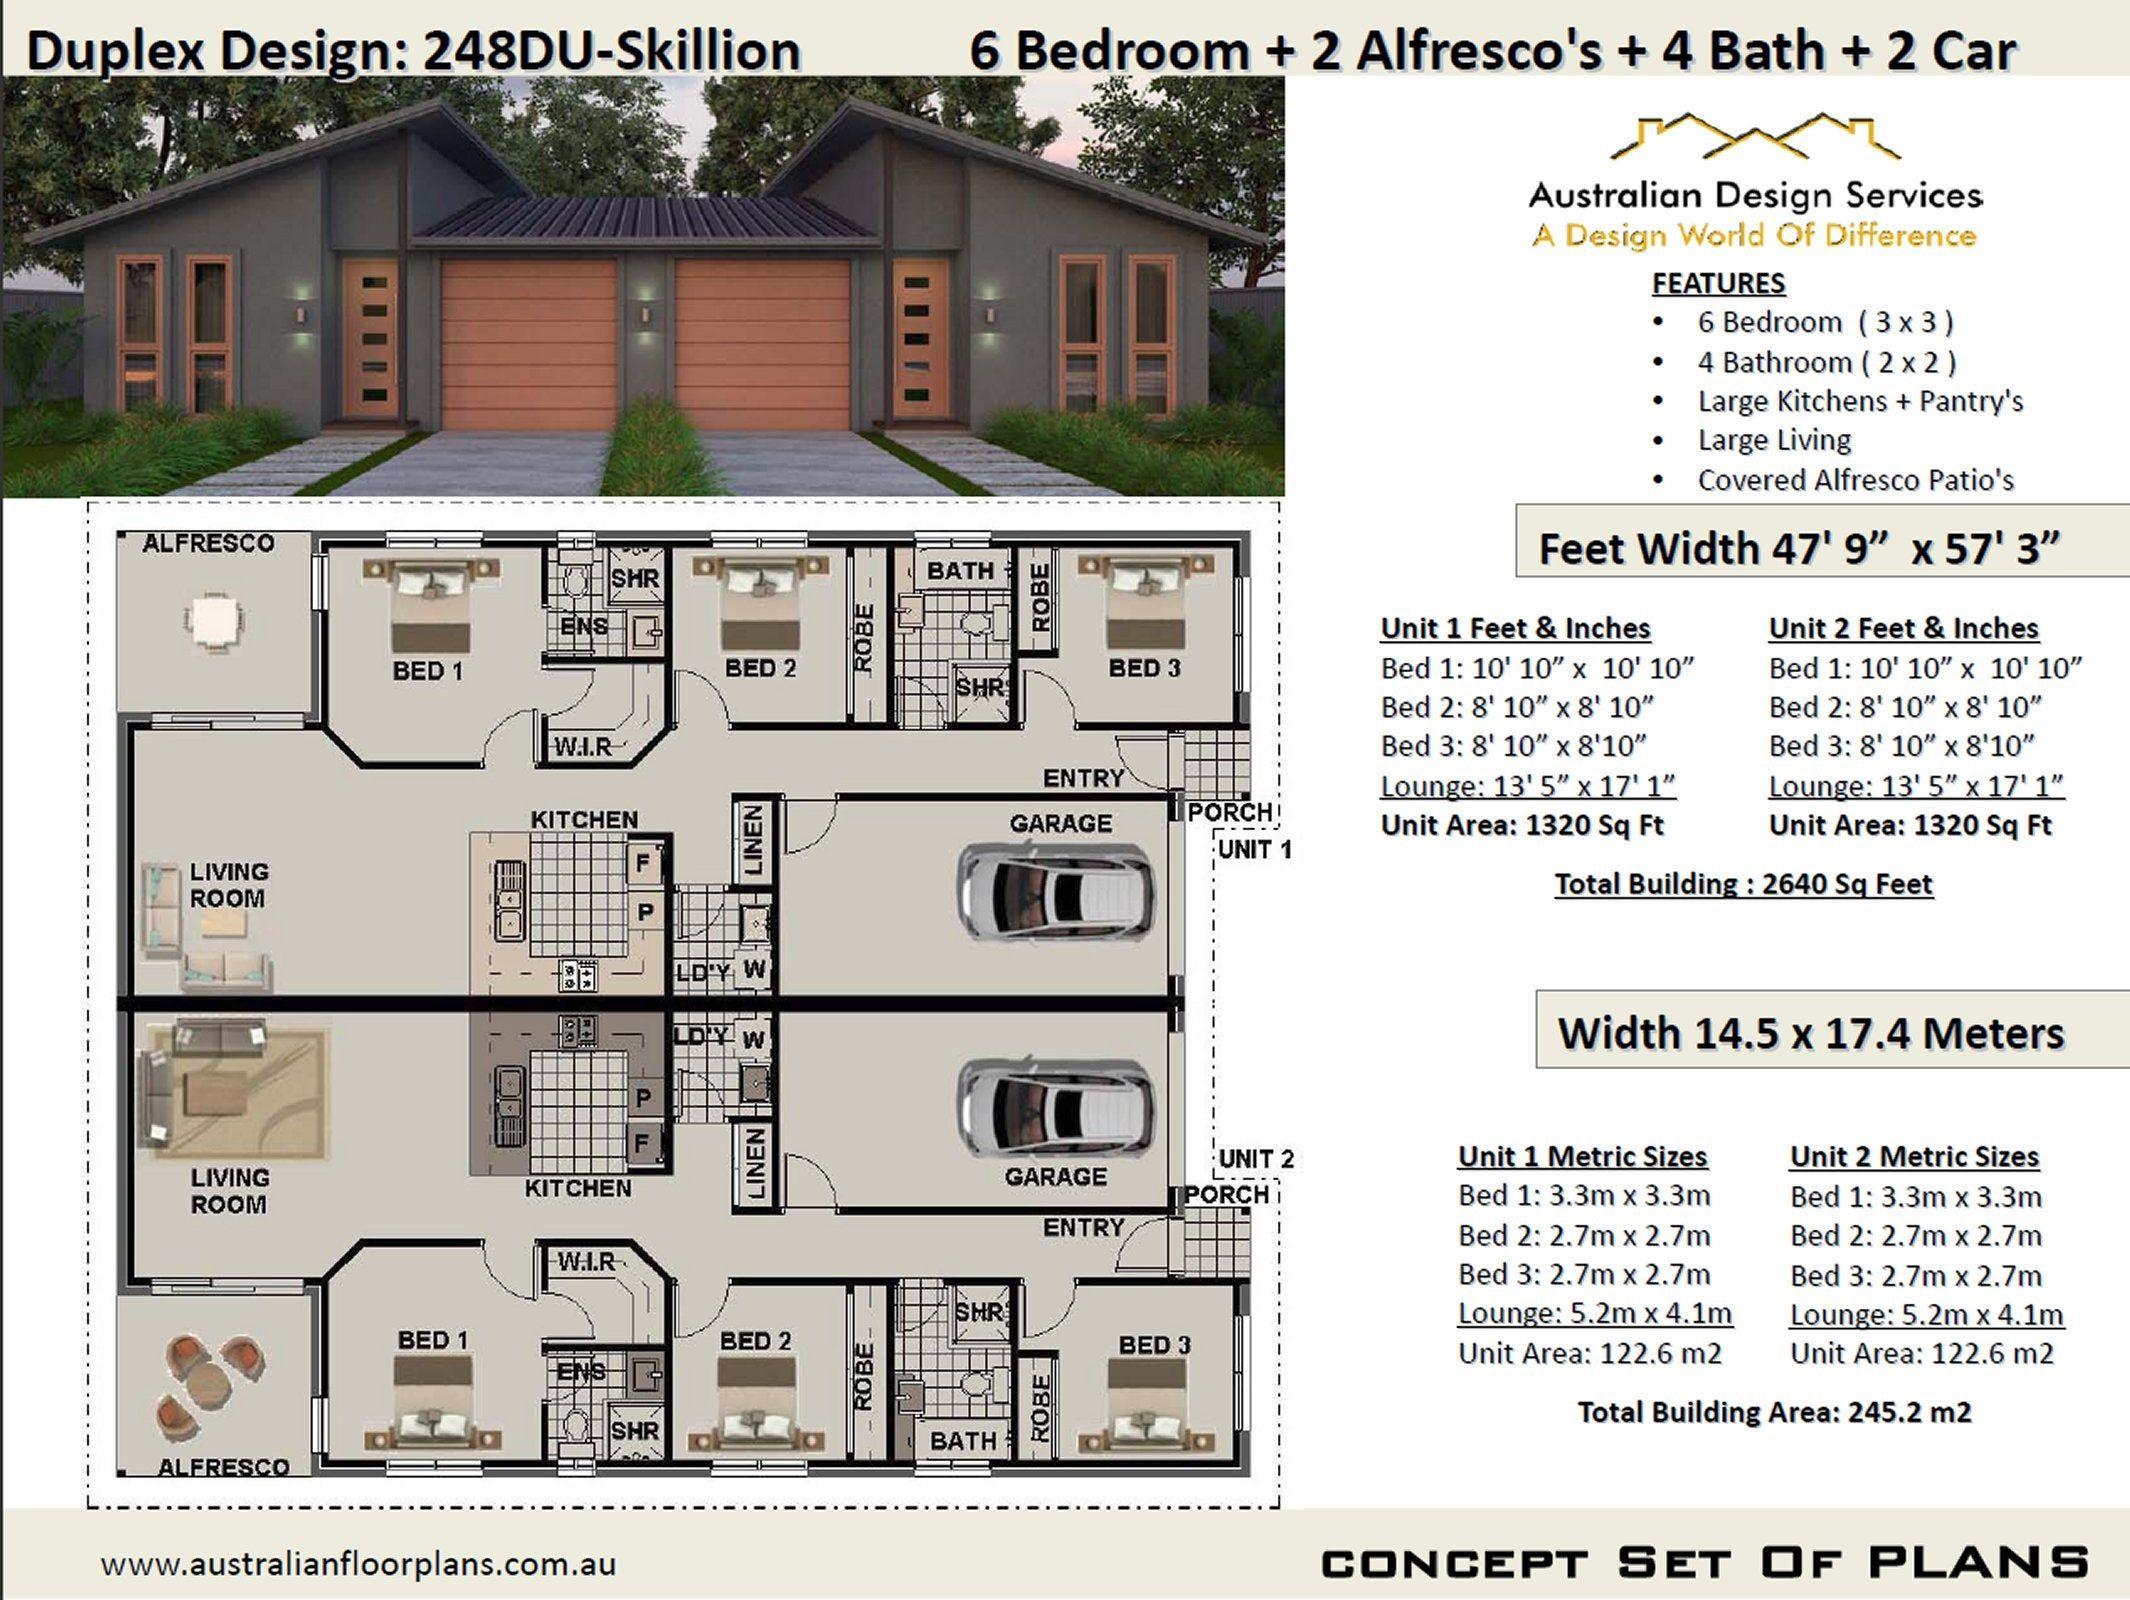 Skillion Roof Duplex Plans 2640 Sq Foot Or 245 2 M2 Etsy Duplex Design Duplex Plans Duplex House Plans